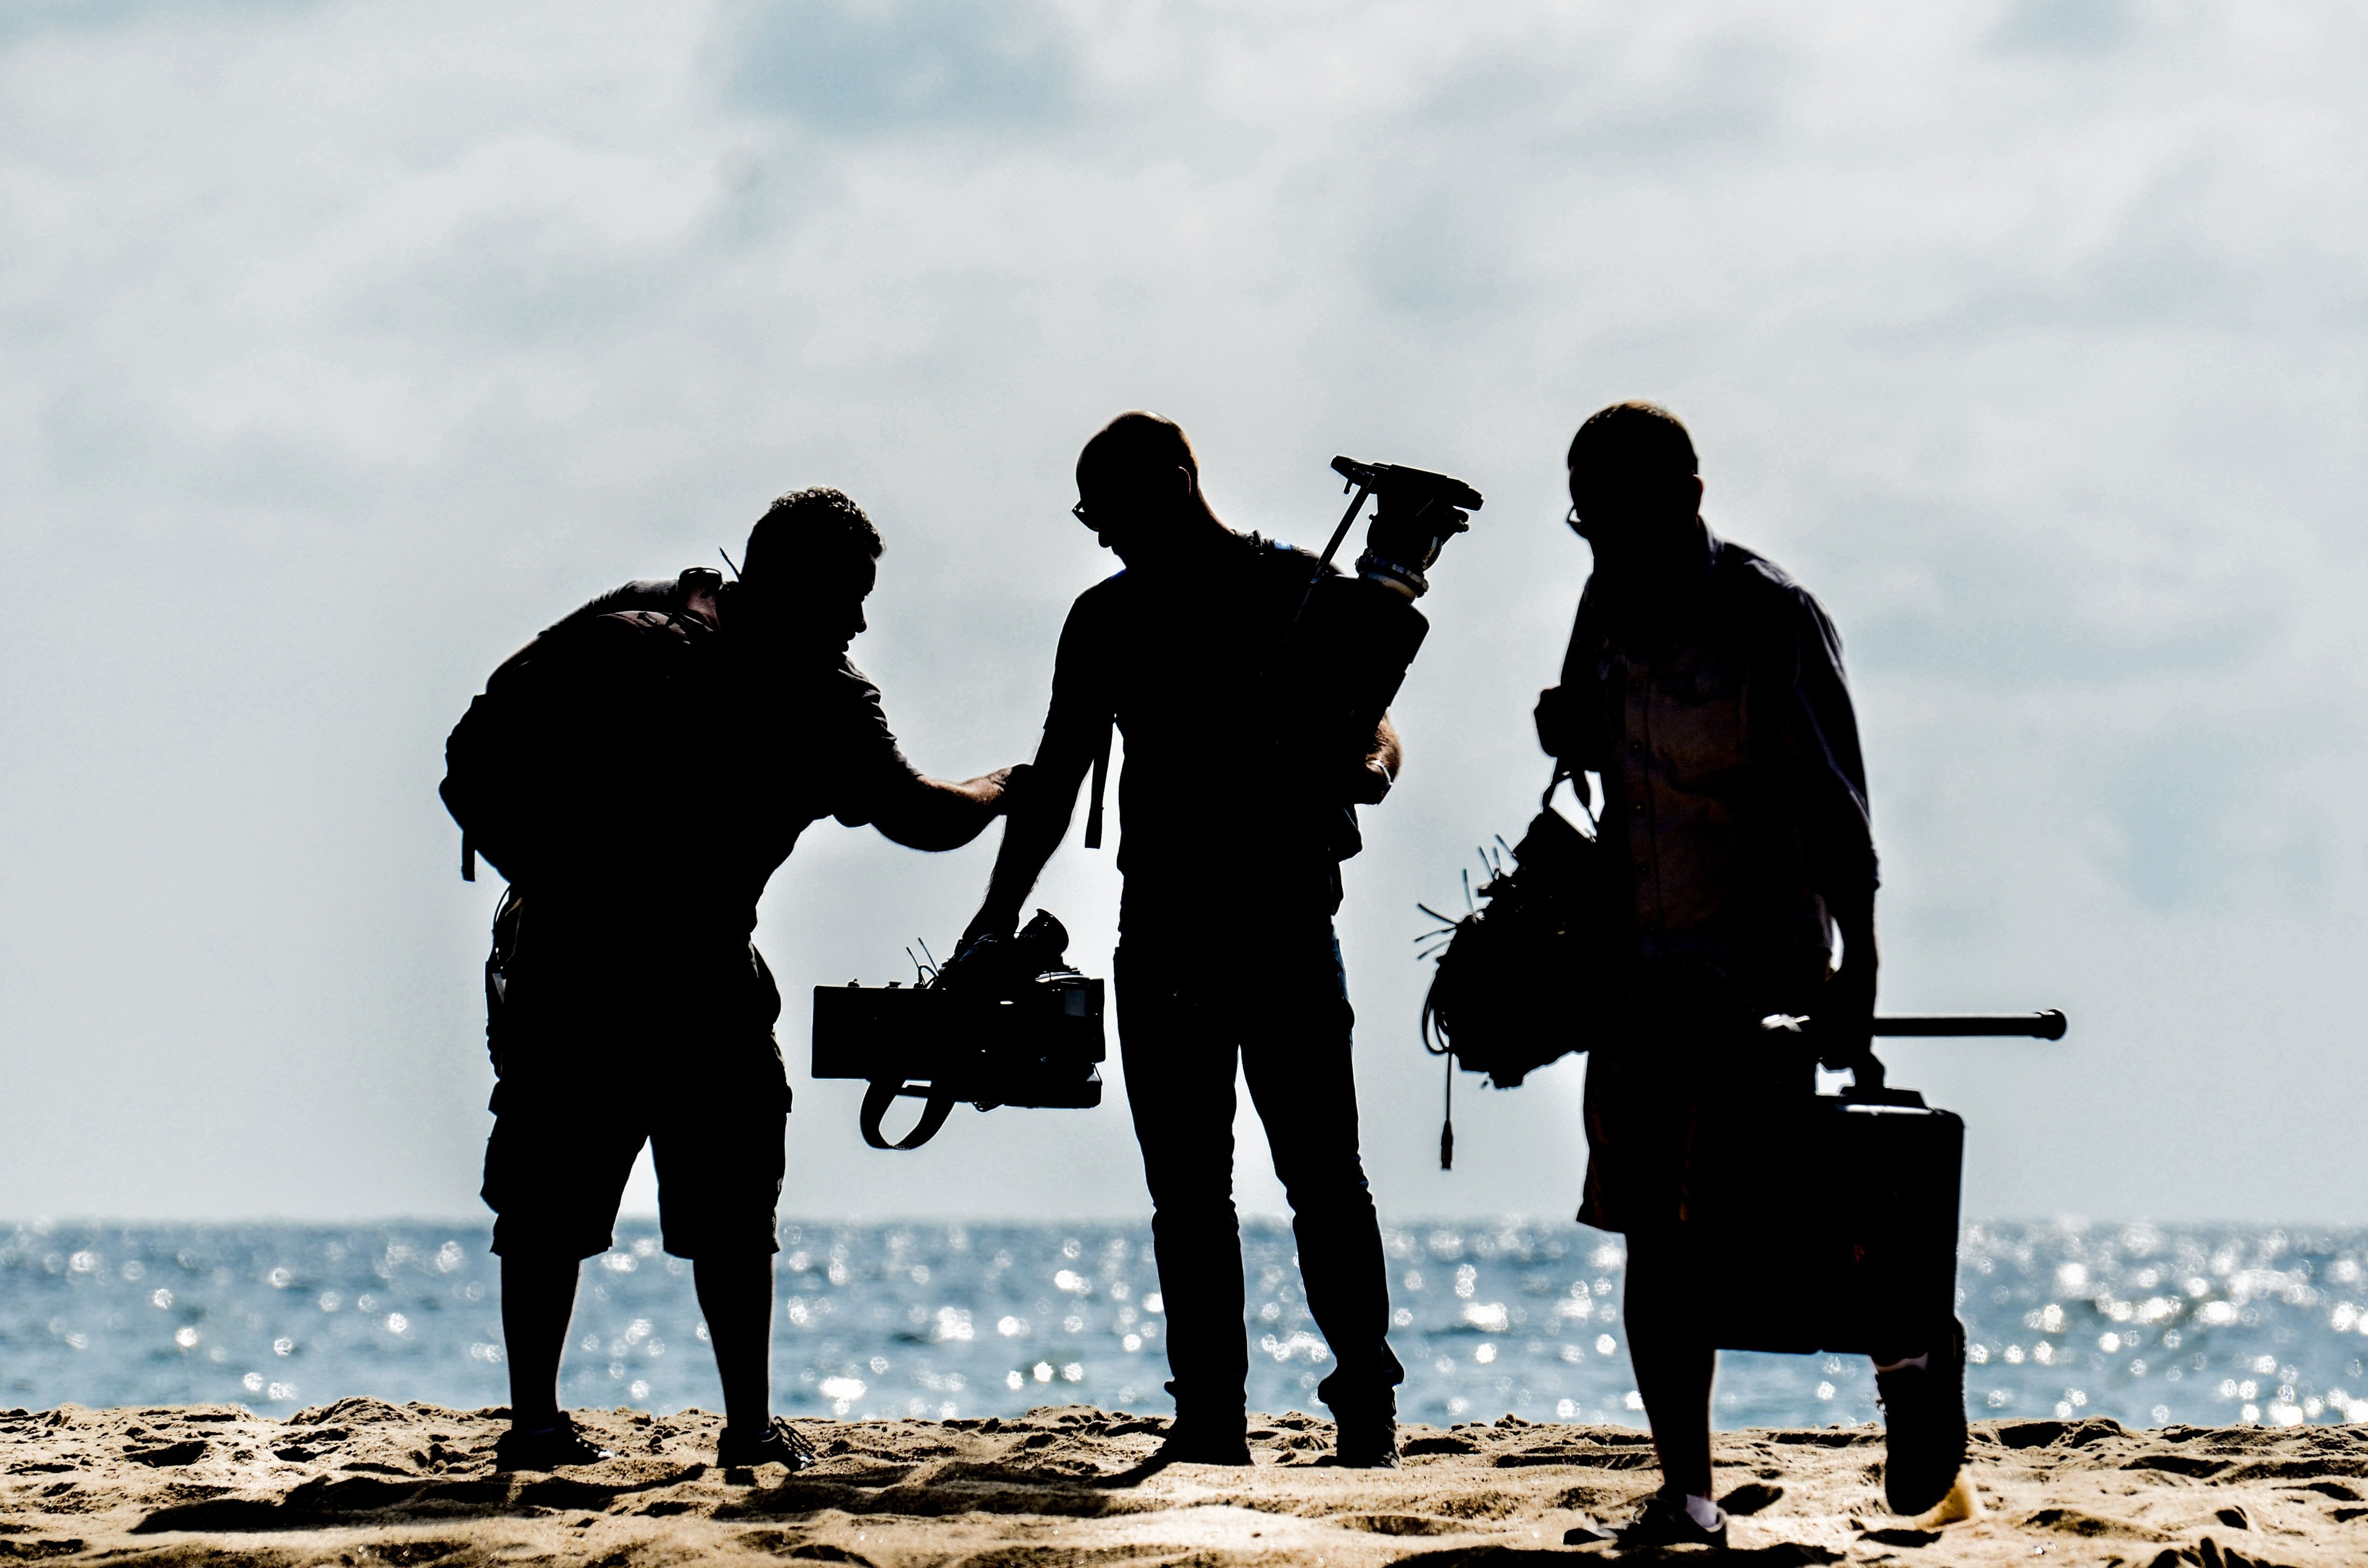 CreatorsBurg! - St. Pete Videography & Photography Community